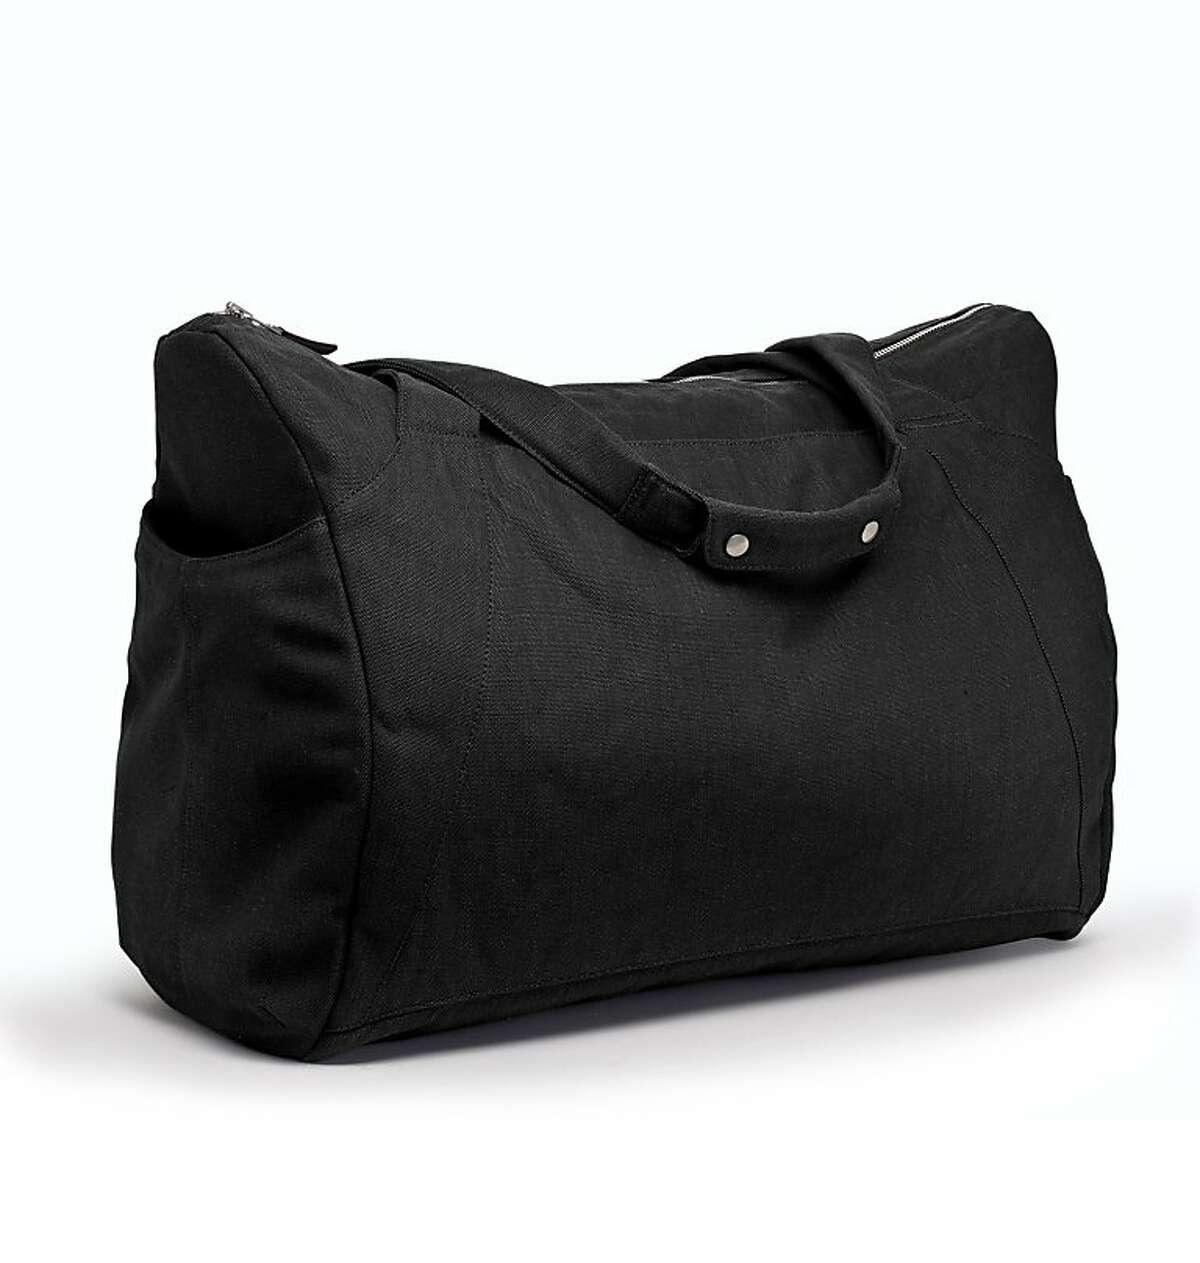 The Fluent Traveler weekend bag by Nau.